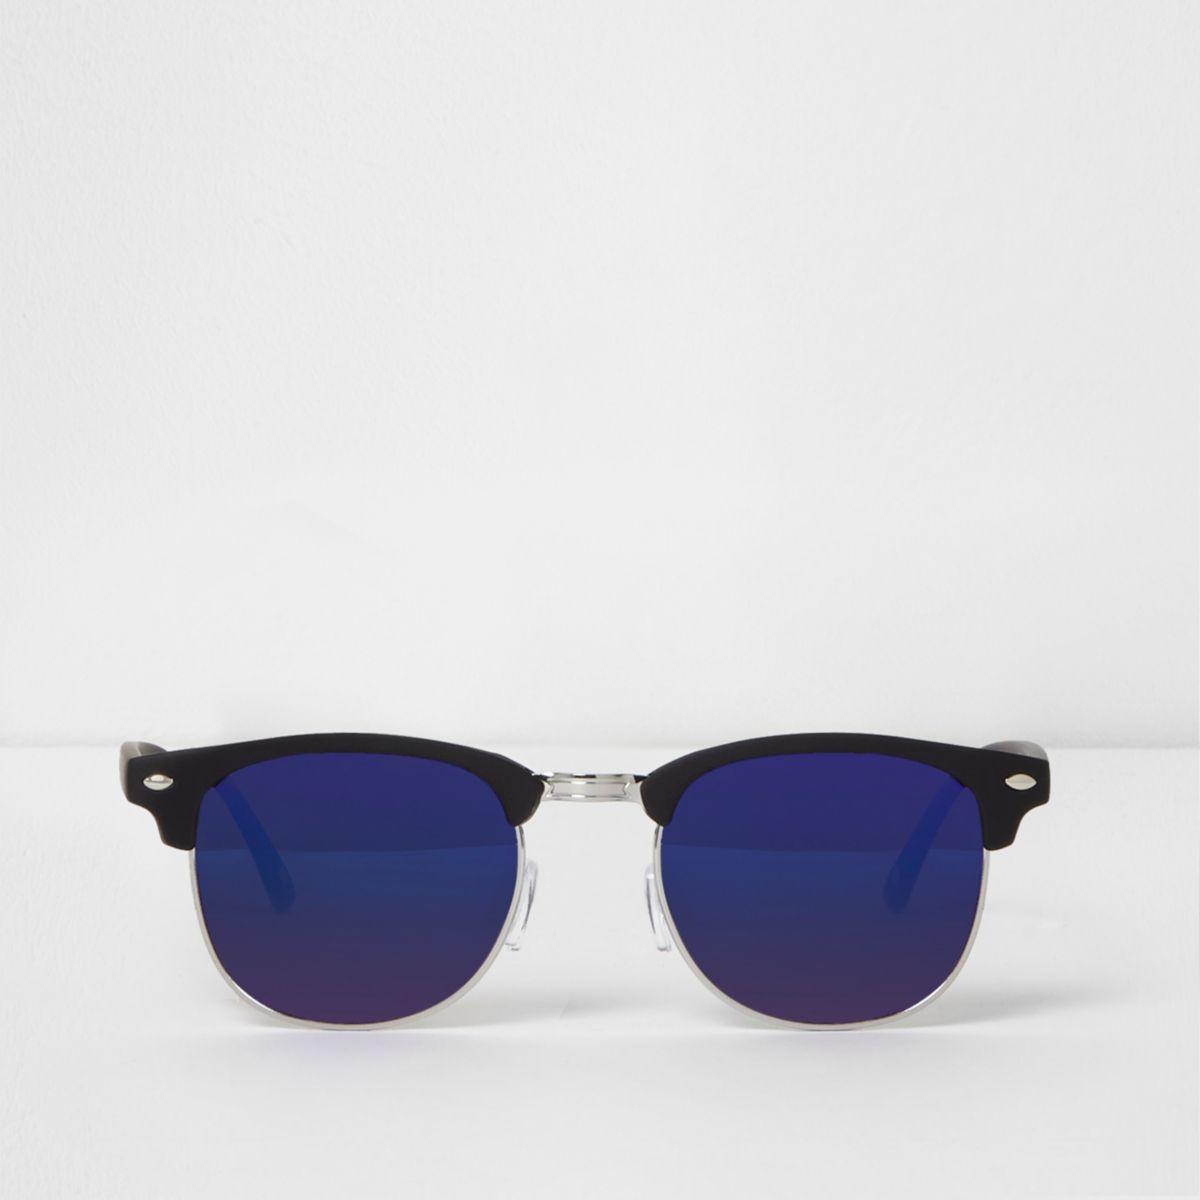 Black half frame retro blue mirror sunglasses